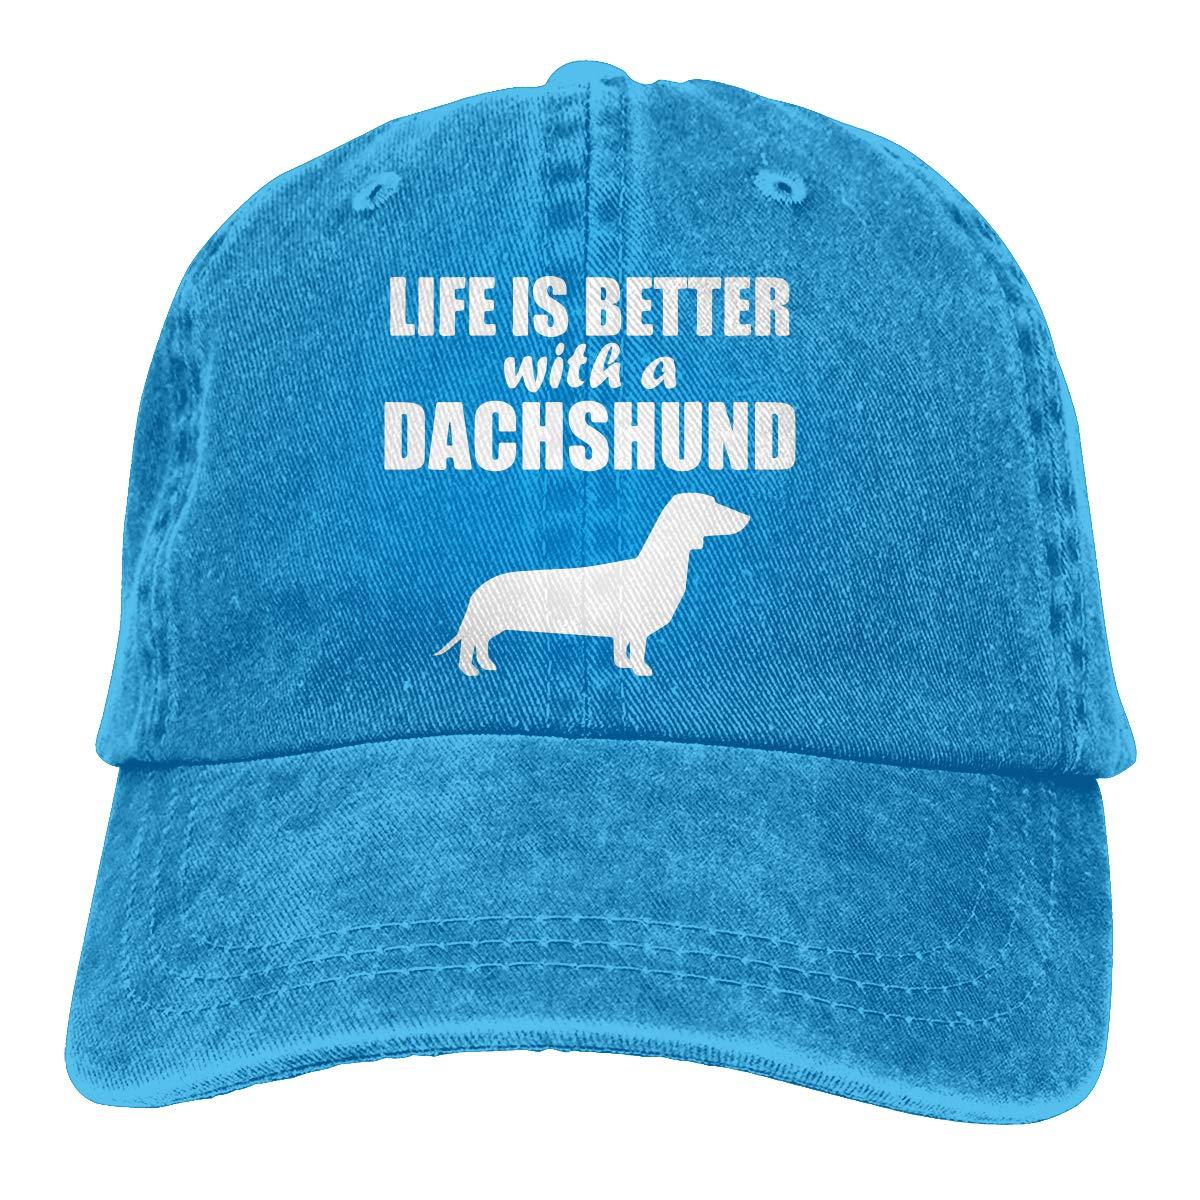 PMGM-C Life is Better with A Dachshund Adult Trendy Denim Hip Hop Cap Adjustable Baseball Cap